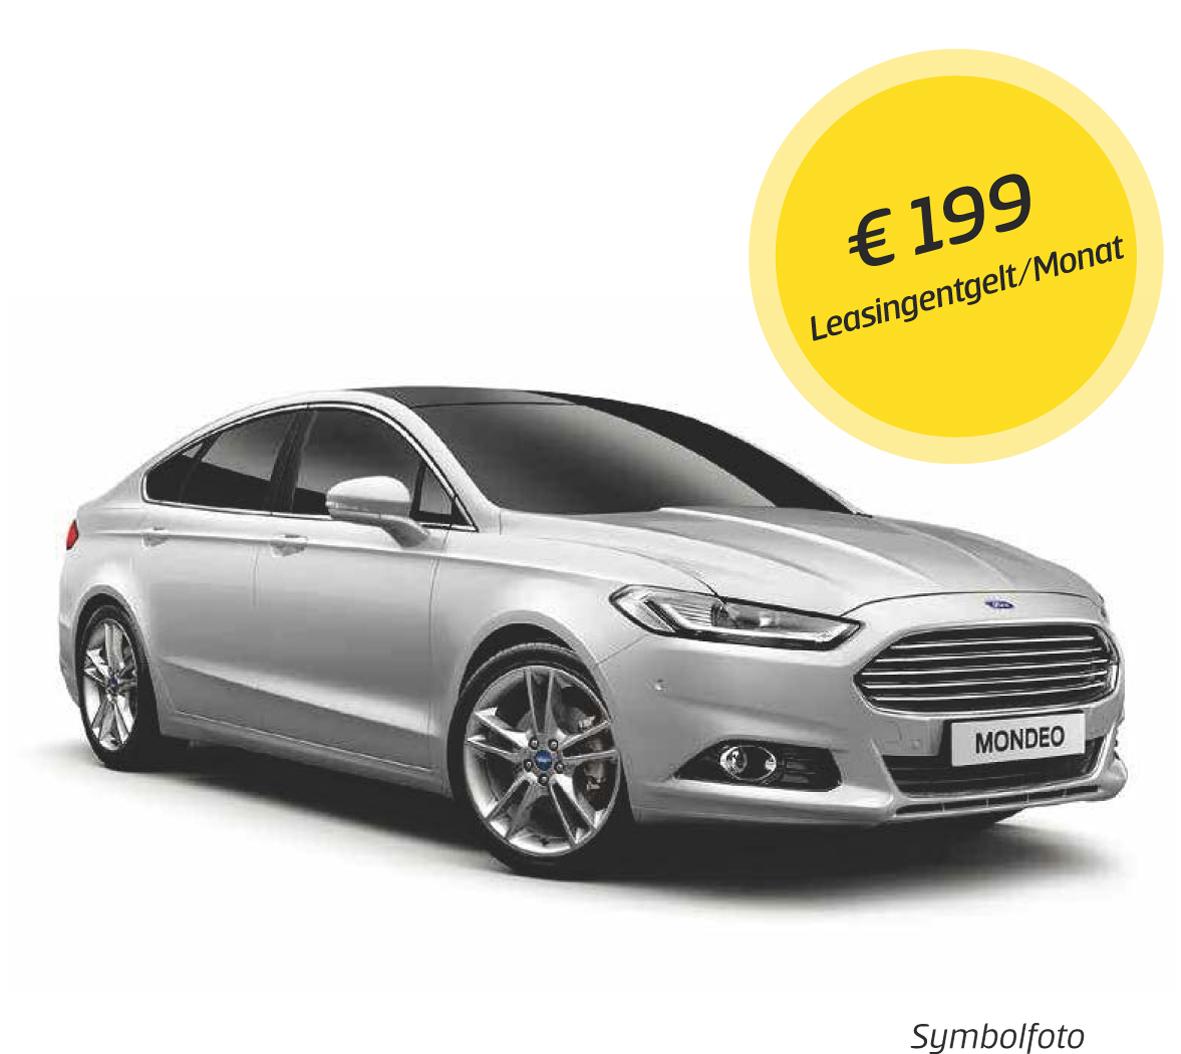 Autoleasing-Angebot| Kärntner Sparkasse